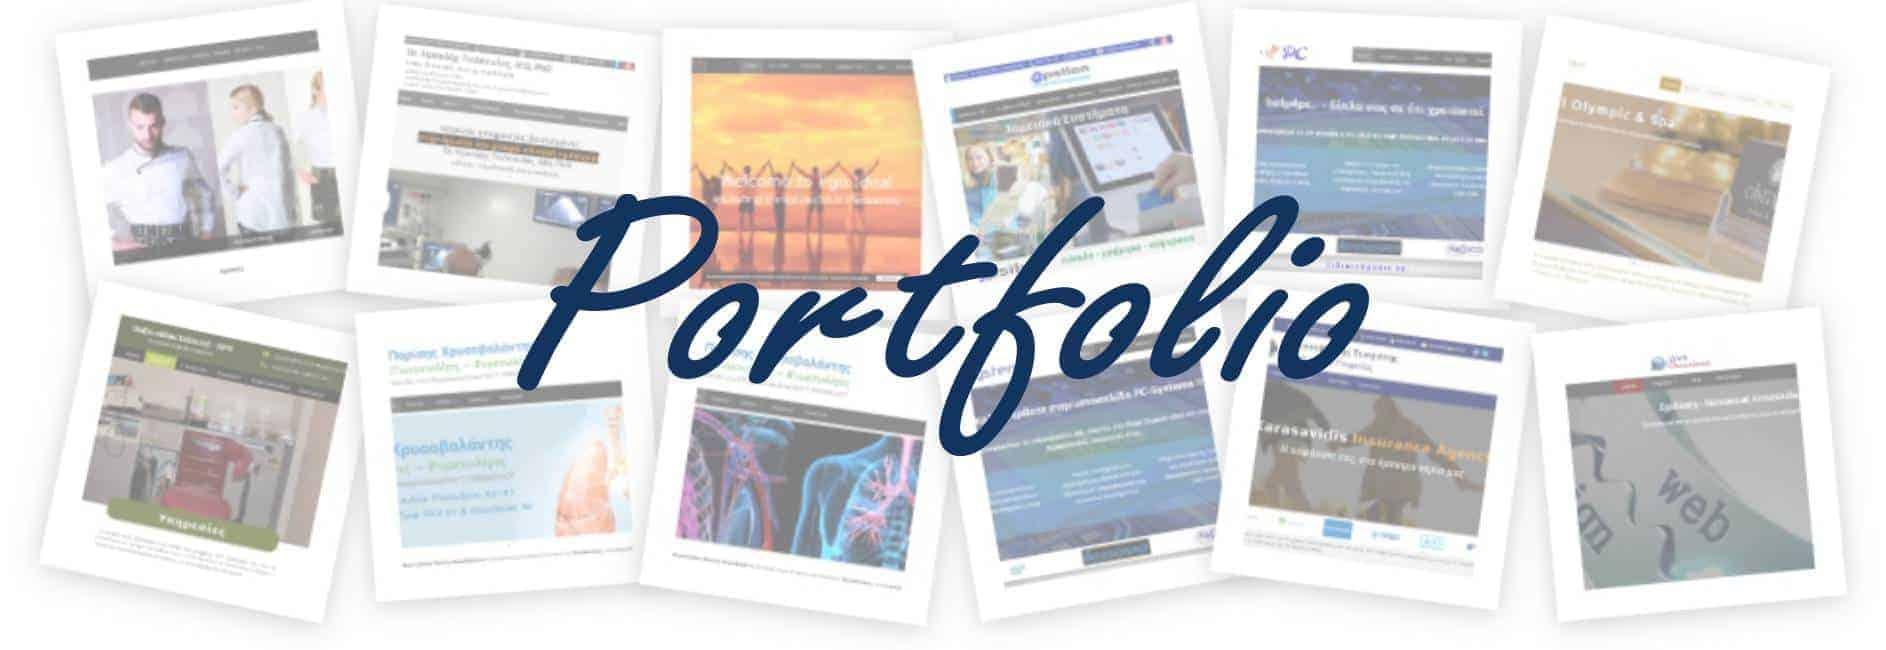 WebCreations-portfolio